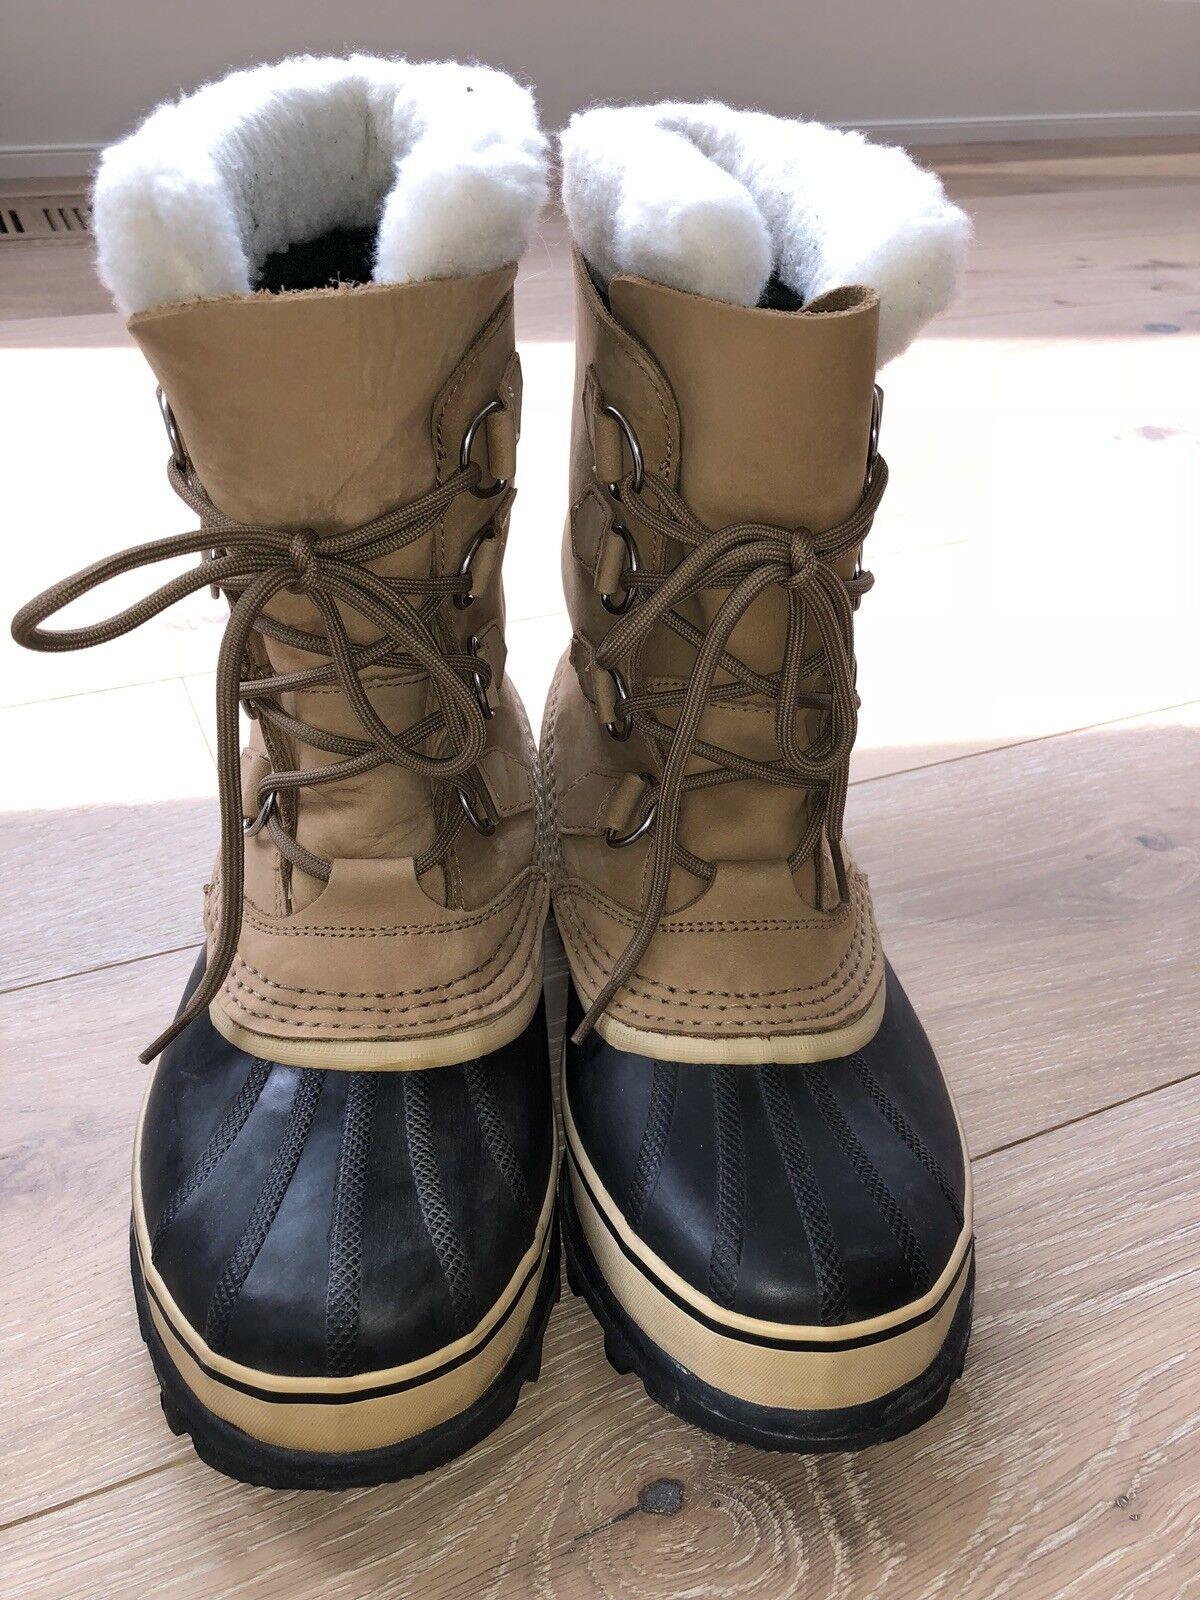 Sorel Caribou Women's NL 1005-280 Buff Brown Waterproof Boots - Size 9